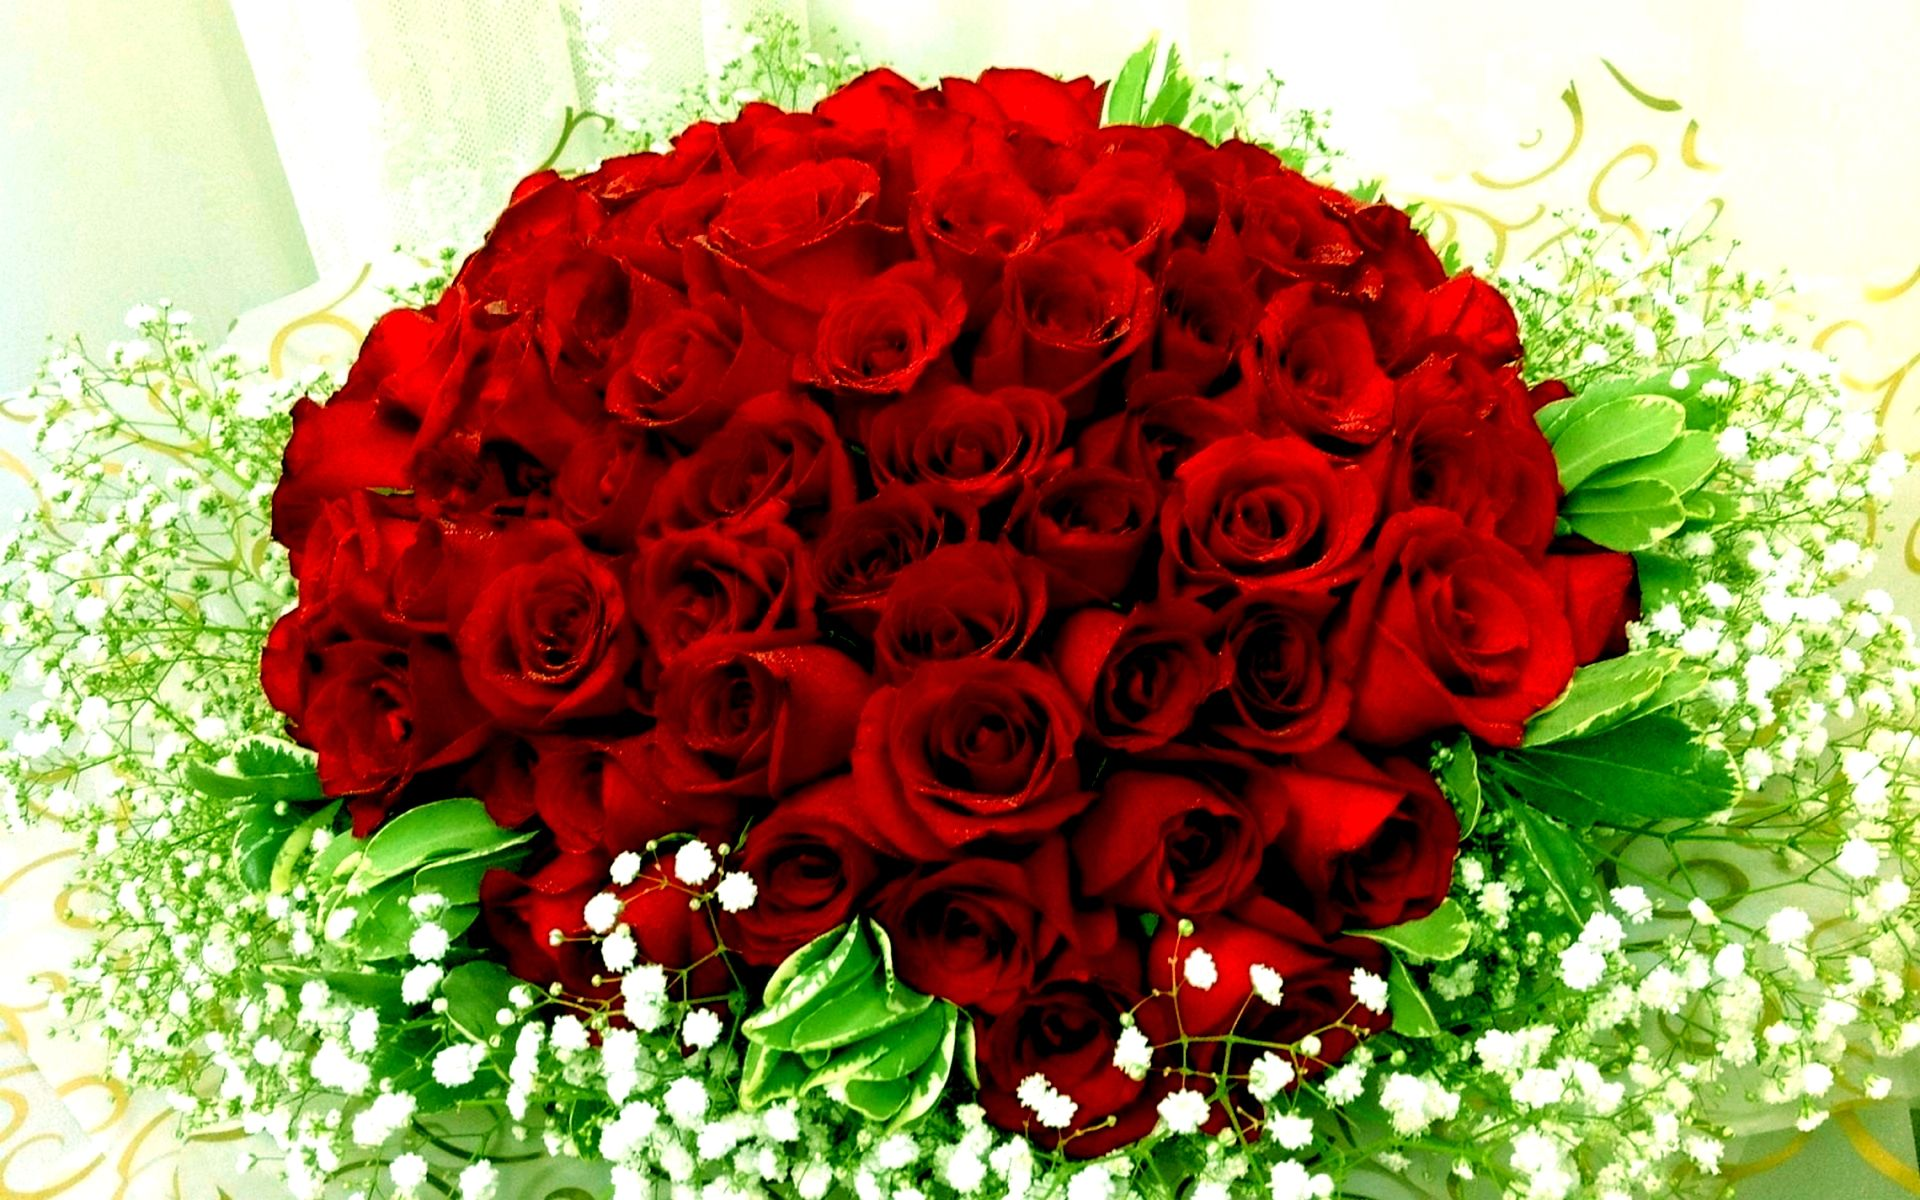 Roses Bouquet 2249 Flowers HD Desktop Wallpaper GOD OF